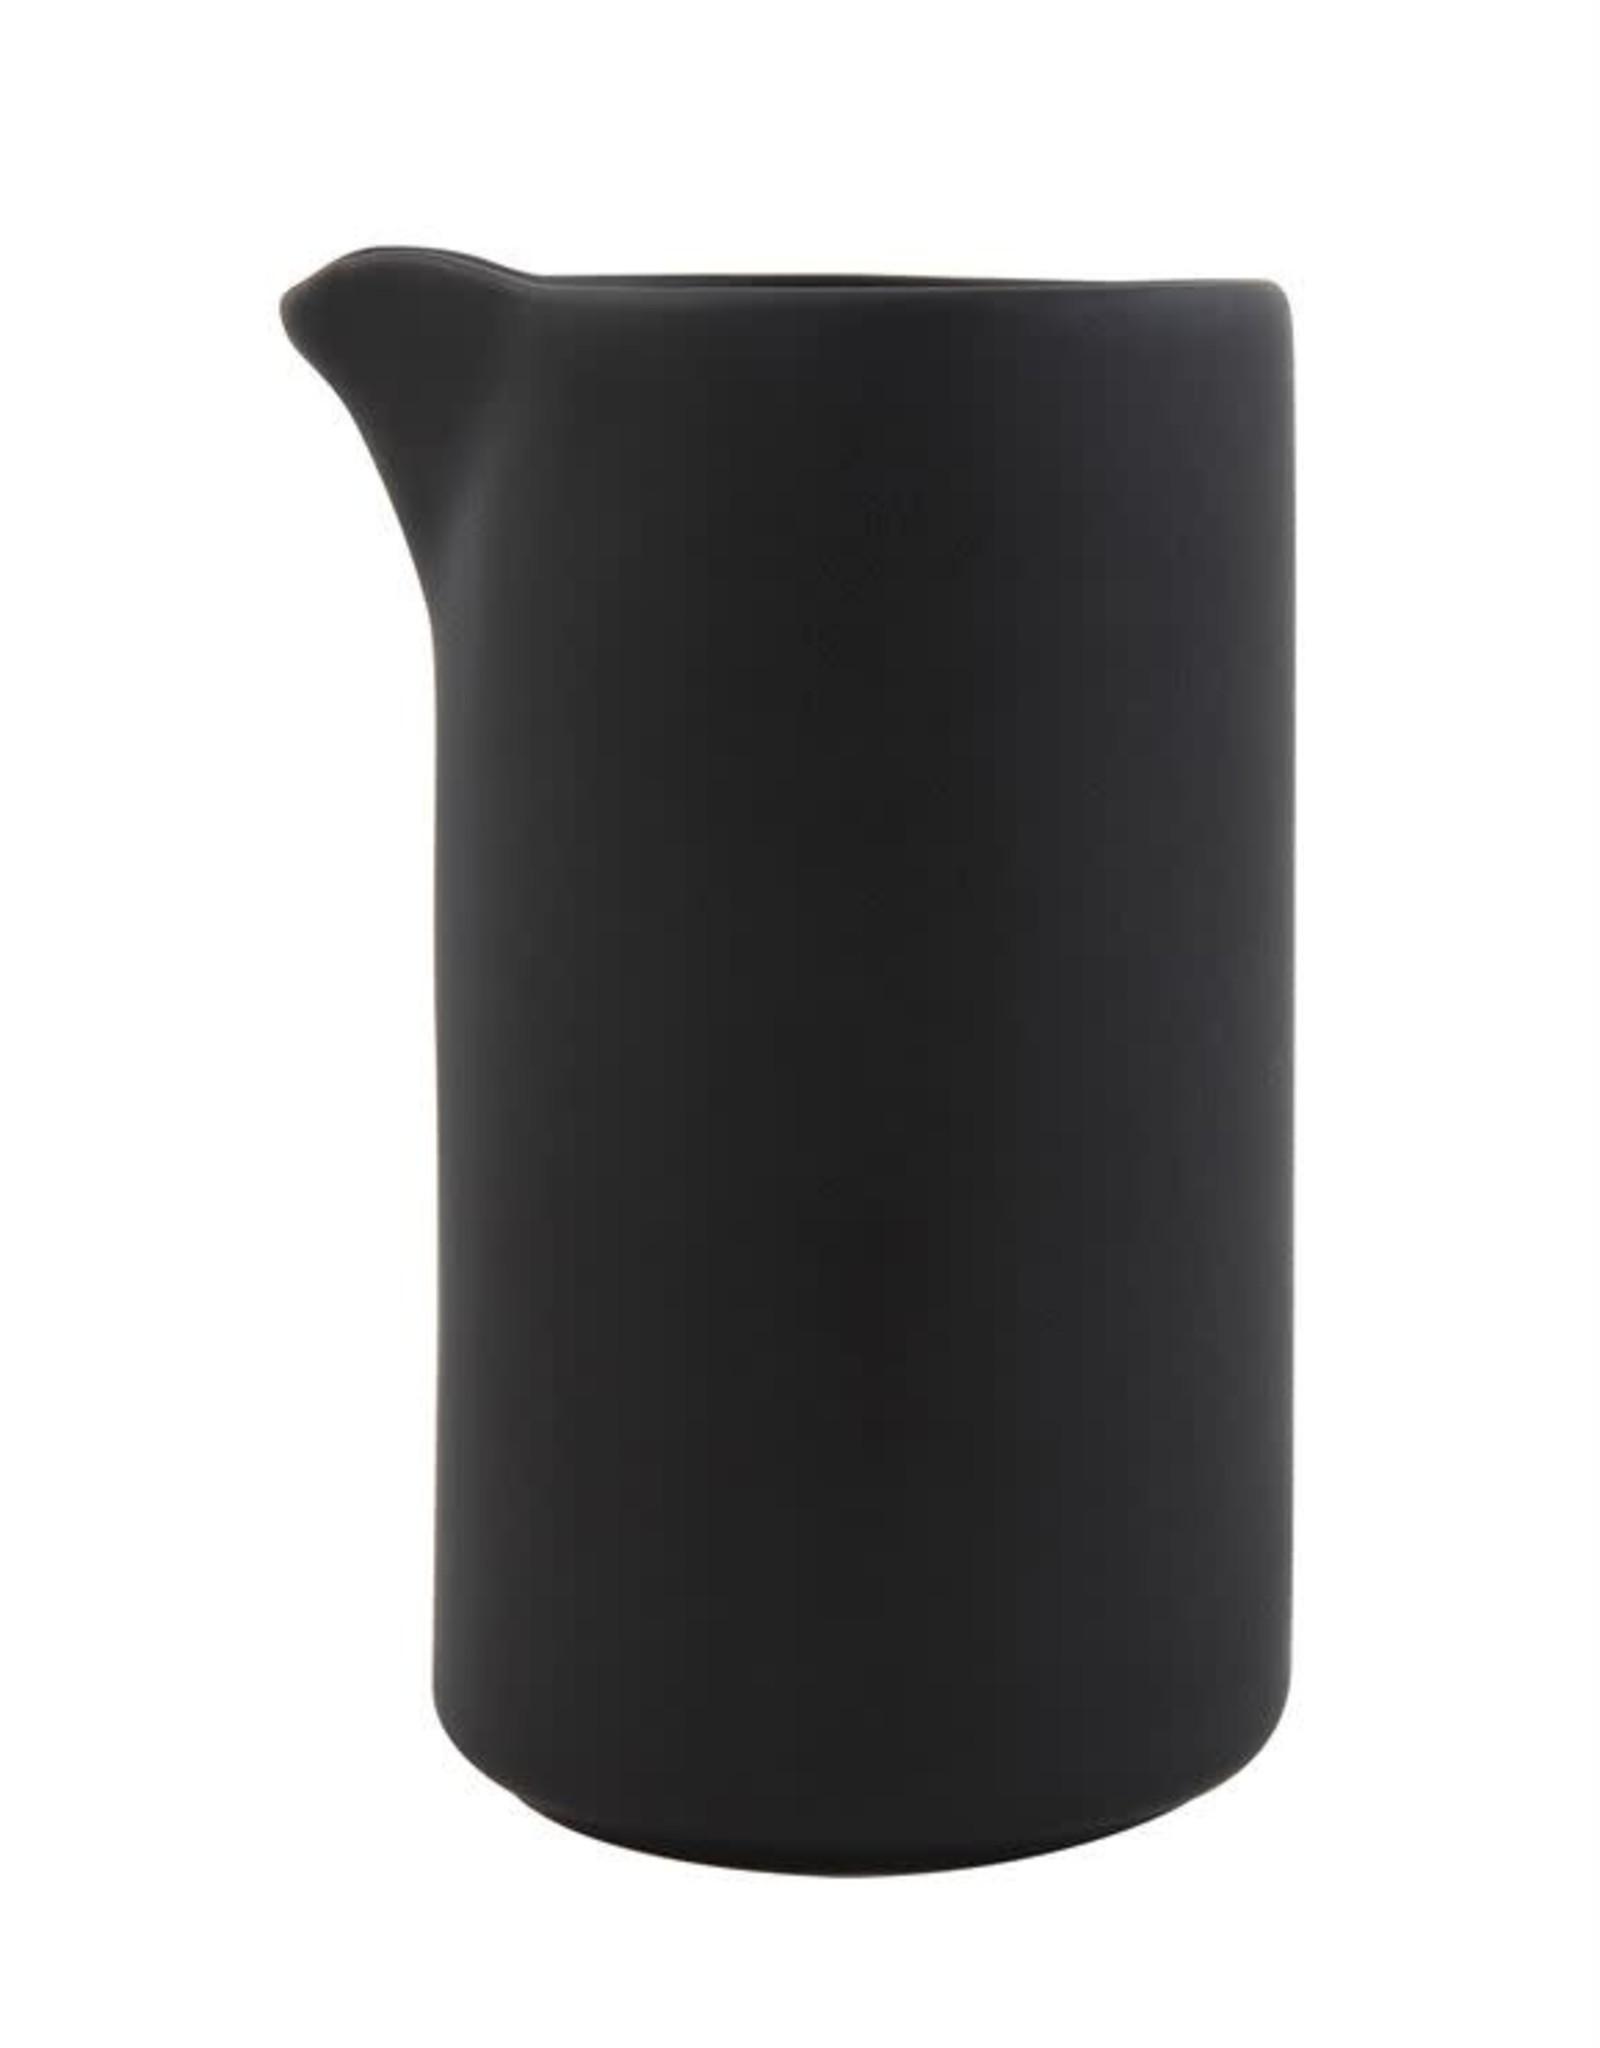 Stoneware Creamer 8 oz. - Matte Black